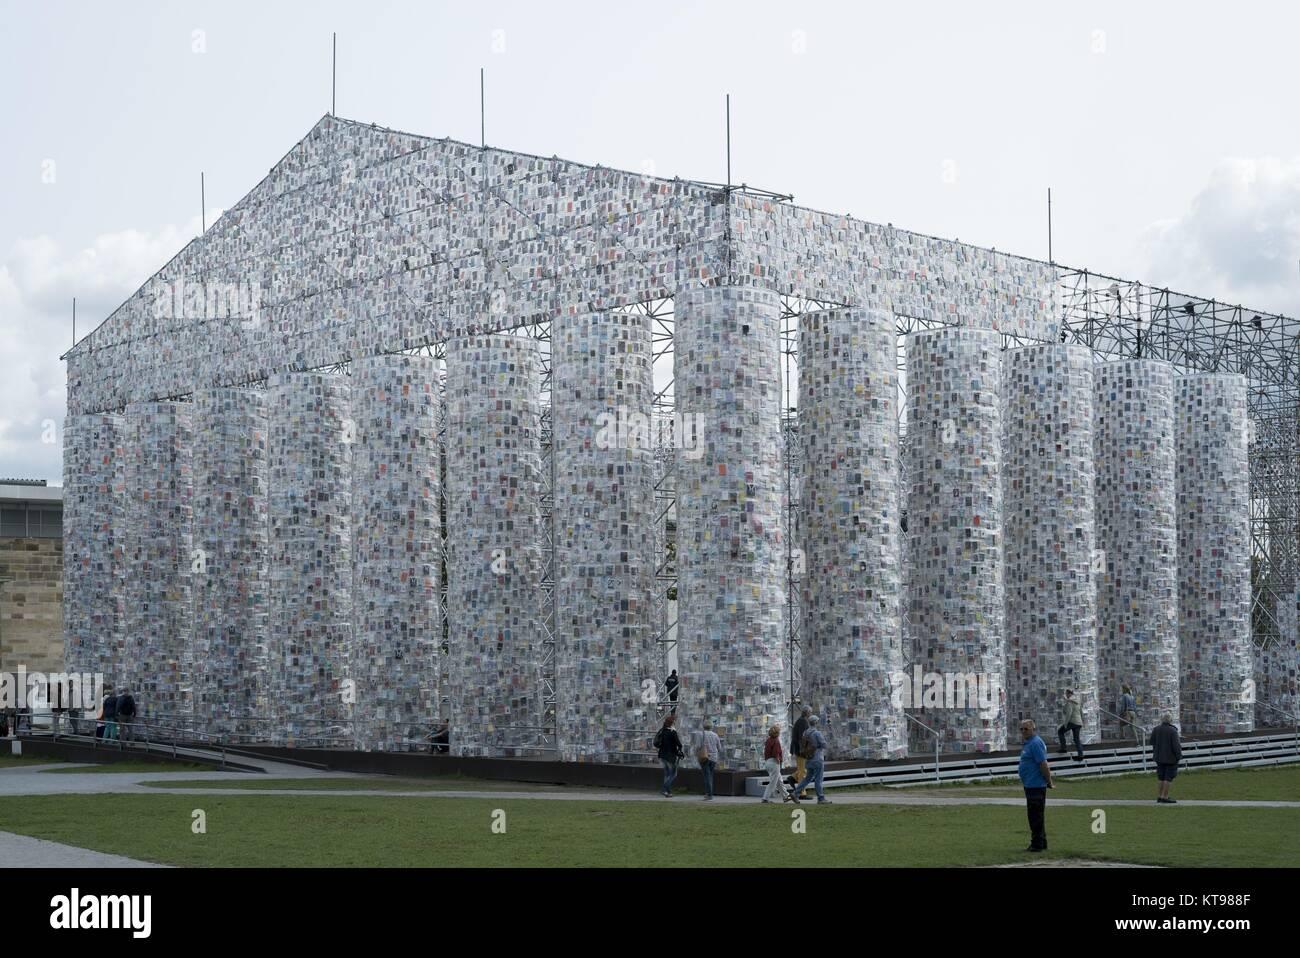 documenta 14 Art Installation Pantheon of Booky by Marta Minujin on Friedrich Square in Kassel , 22.8.2017  ATTENTION: - Stock Image